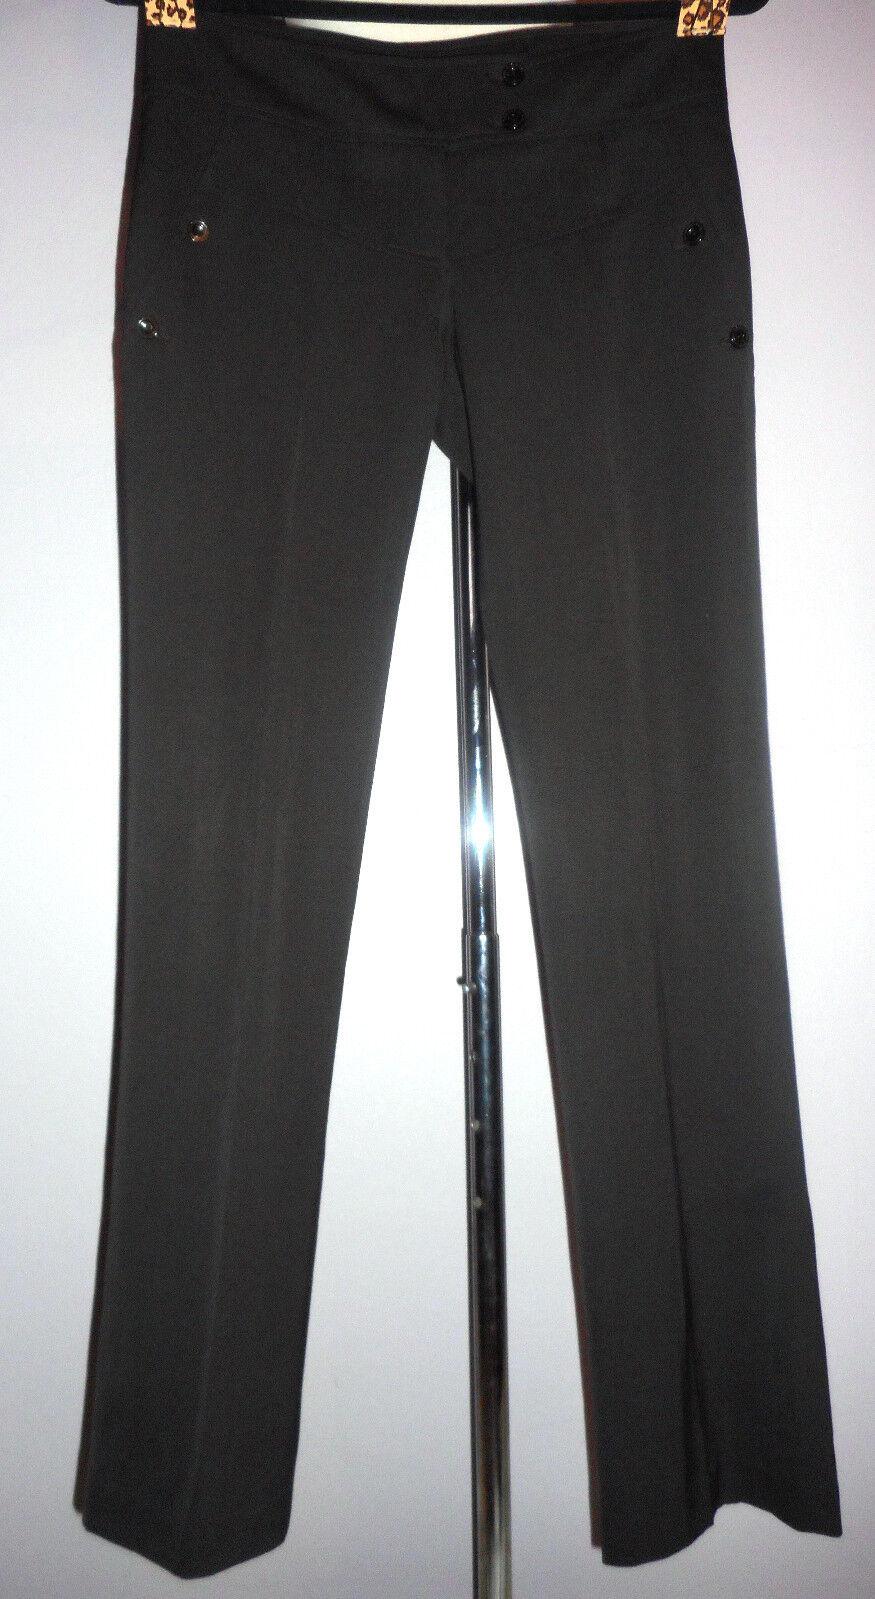 Patrizia Pepe brown virgin wool career Pants, low rise, size 40  (4 US)